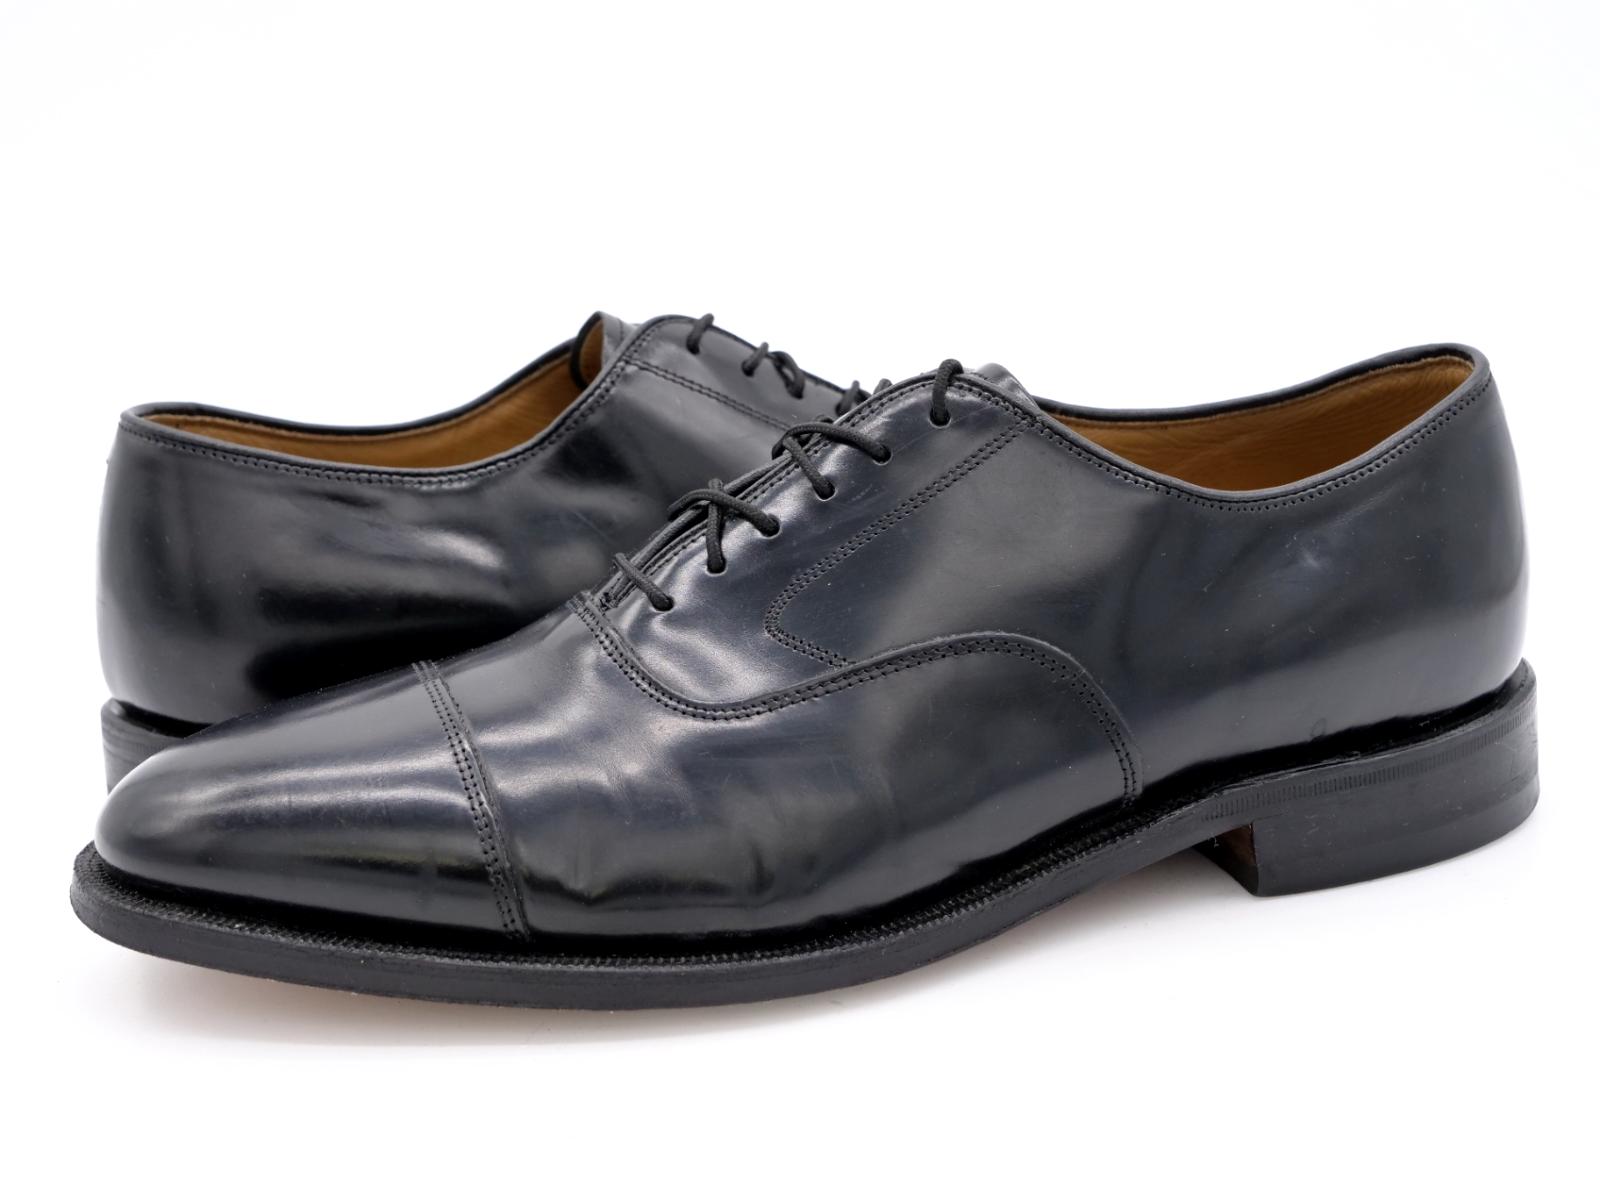 Johnston & Murphy Mens 9.5D Black Leather Lace Up Cap Toe Oxford Dress Shoes